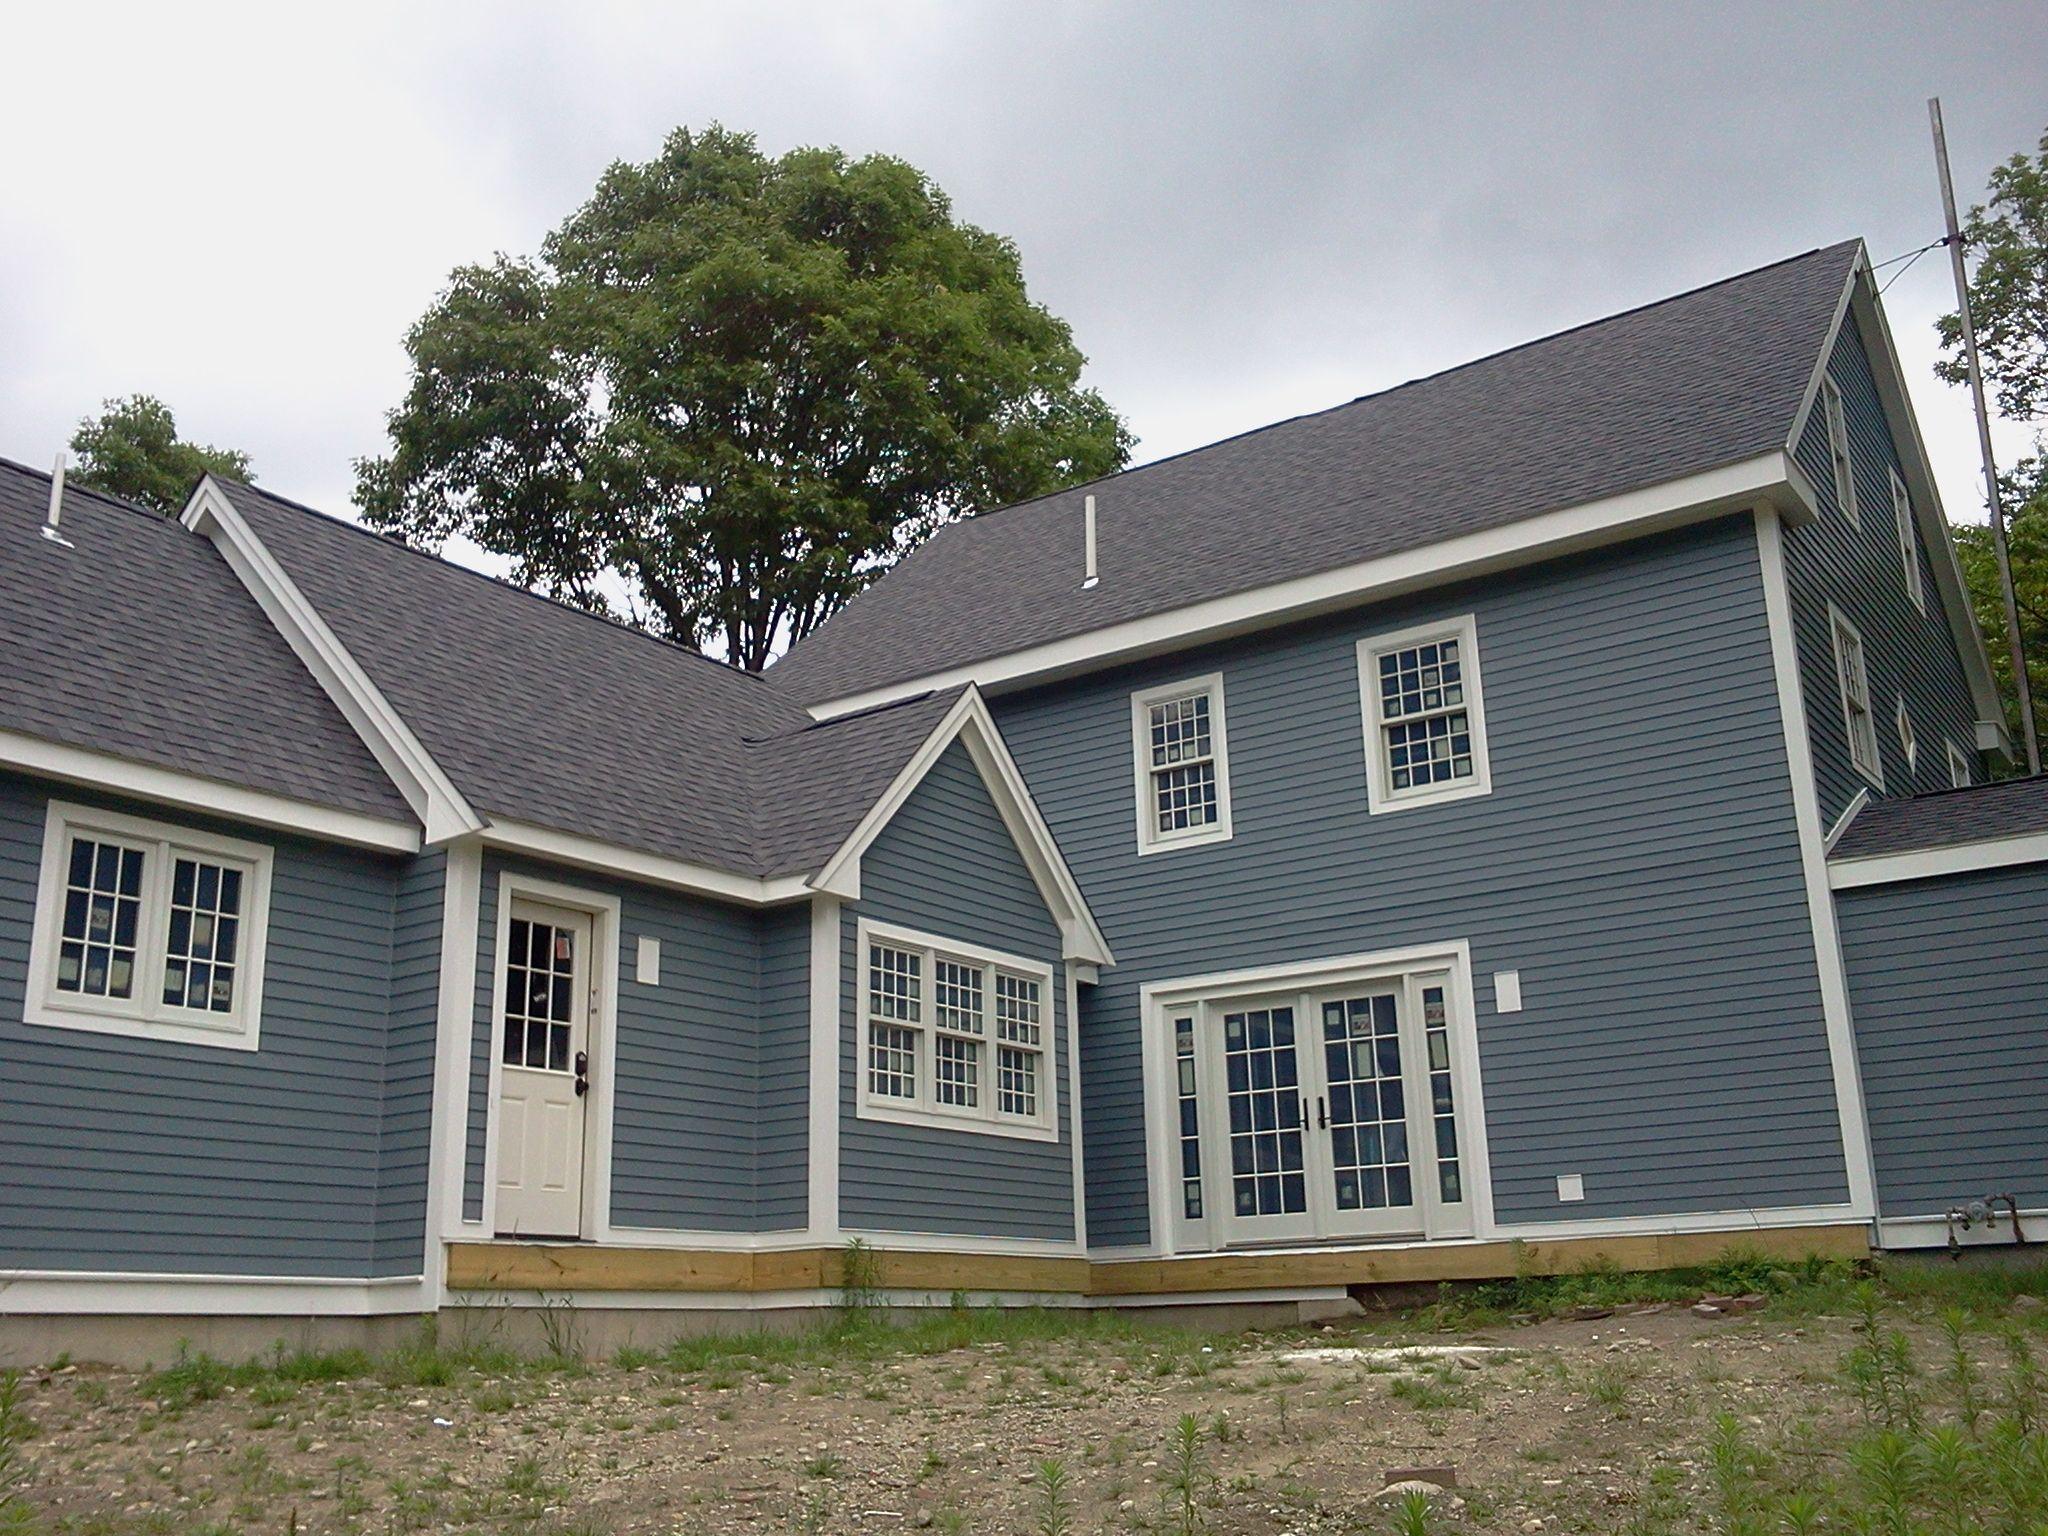 Hardiplank Boothbay Blue Color On Historic Sharon Ma Home House Siding Hardy Plank Siding Craftsman House